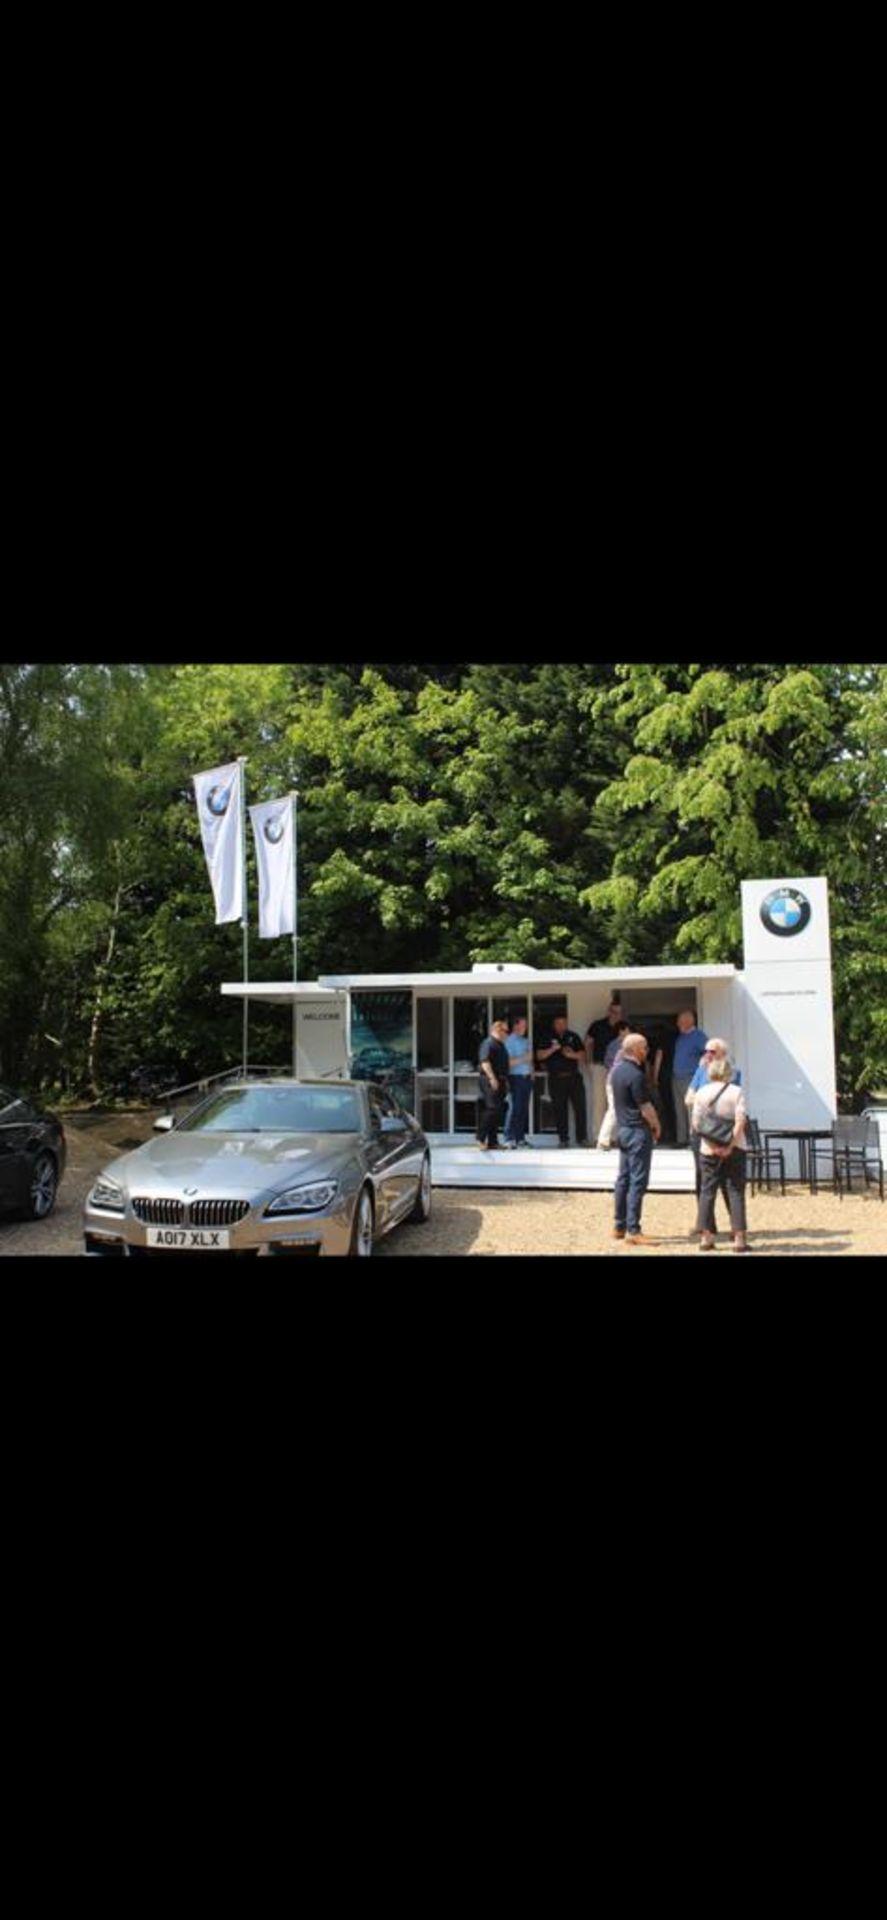 EX BMW EXIBITION UNIT ON TRAILER - Image 27 of 32